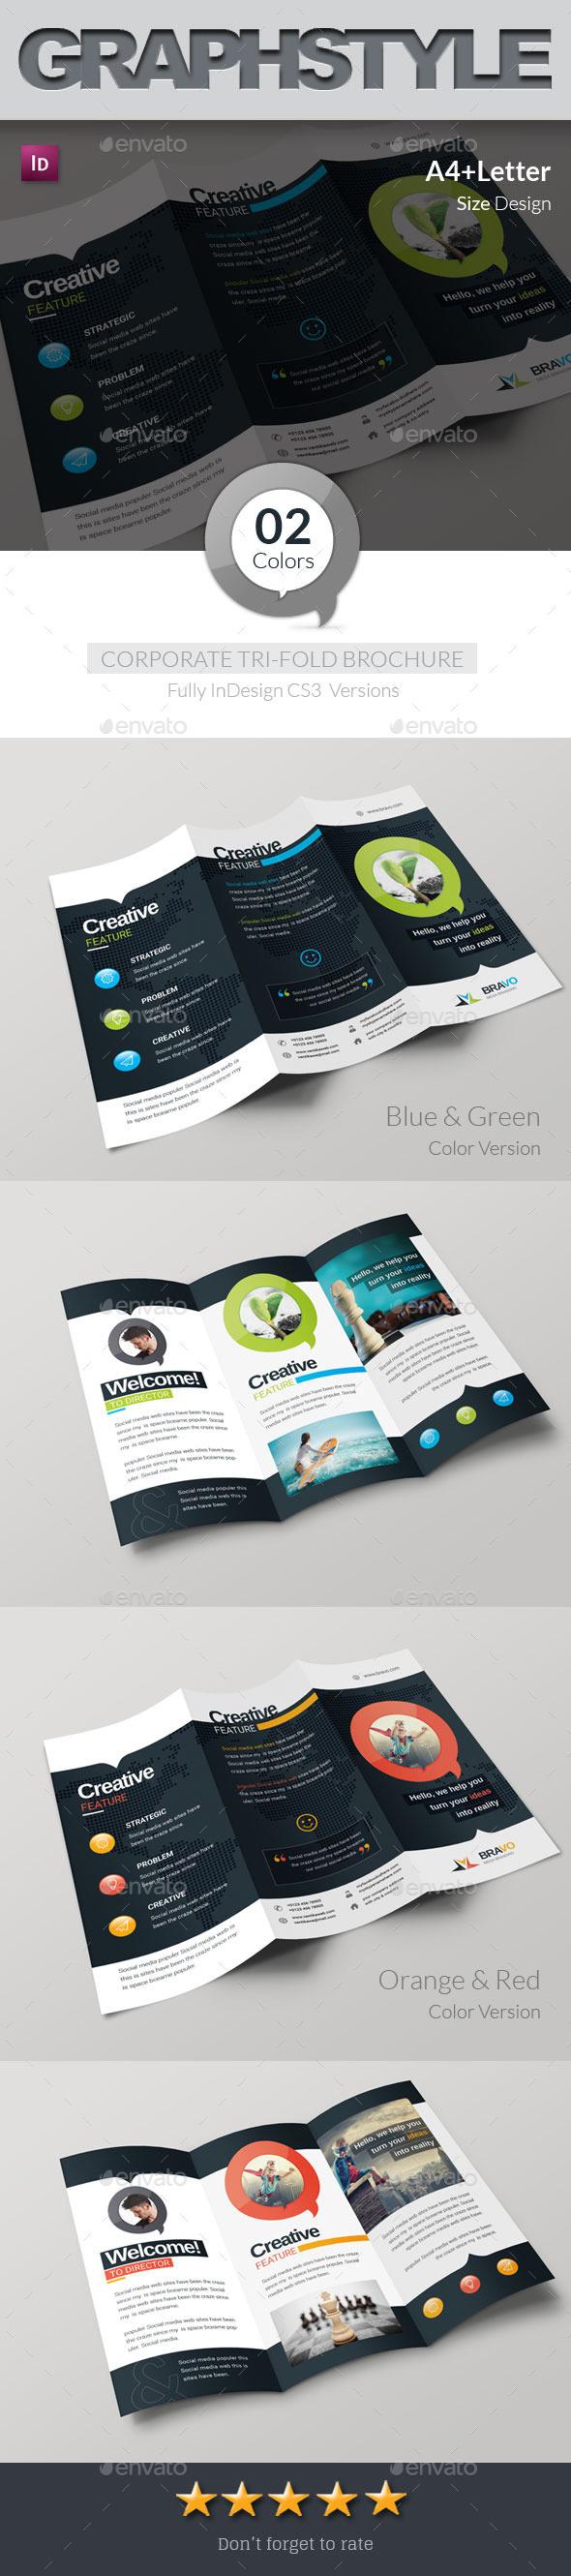 Letter Size Tri Fold Brochure Template - Bravo Corporate & Creative Tri Fold Brochure Template Design